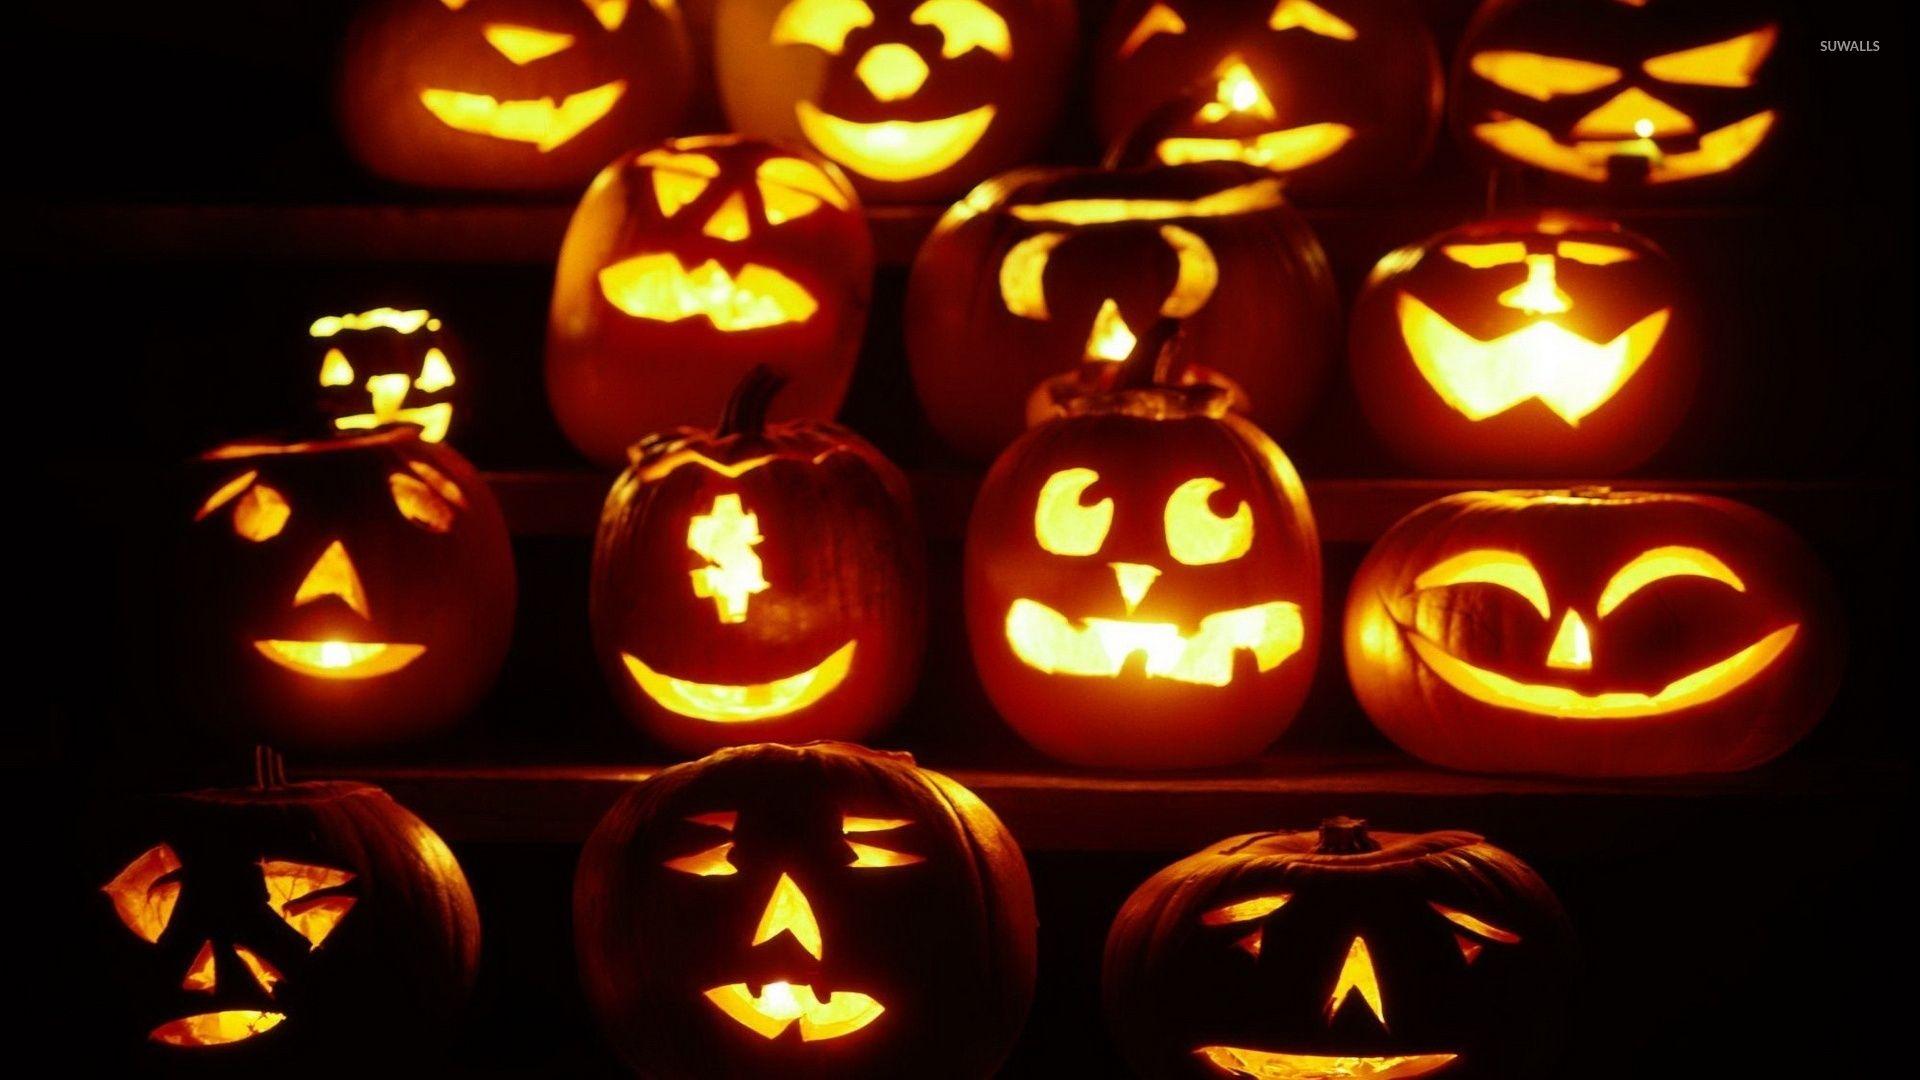 Jack O Lantern Wallpaper Photo Creative Pumpkin Carving Pumpkin Carving Pumpkin Wallpaper